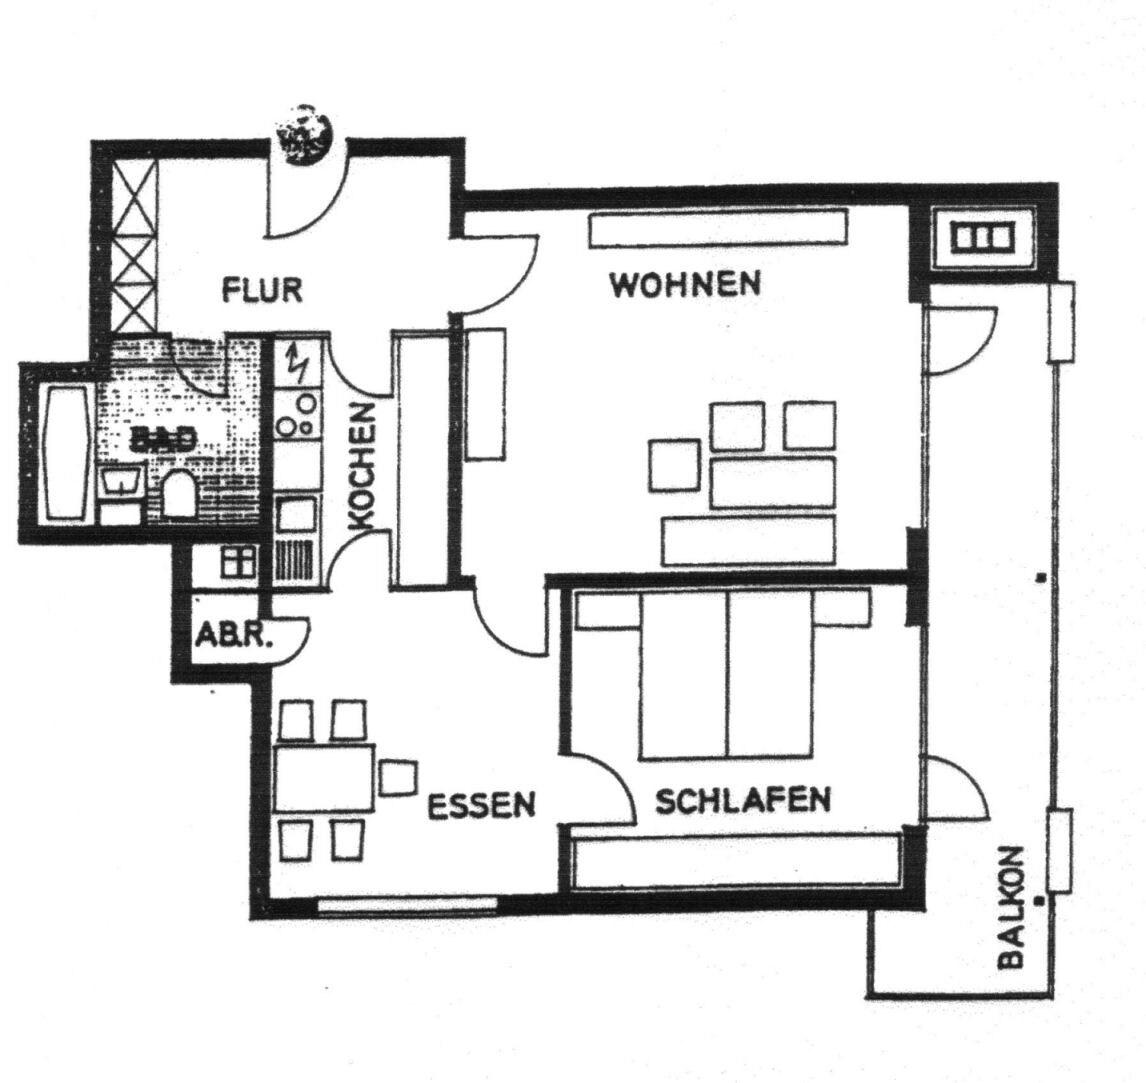 Haus Syltrose List haus syltrose list schnoor hs schnoor hs berliner ring apartment